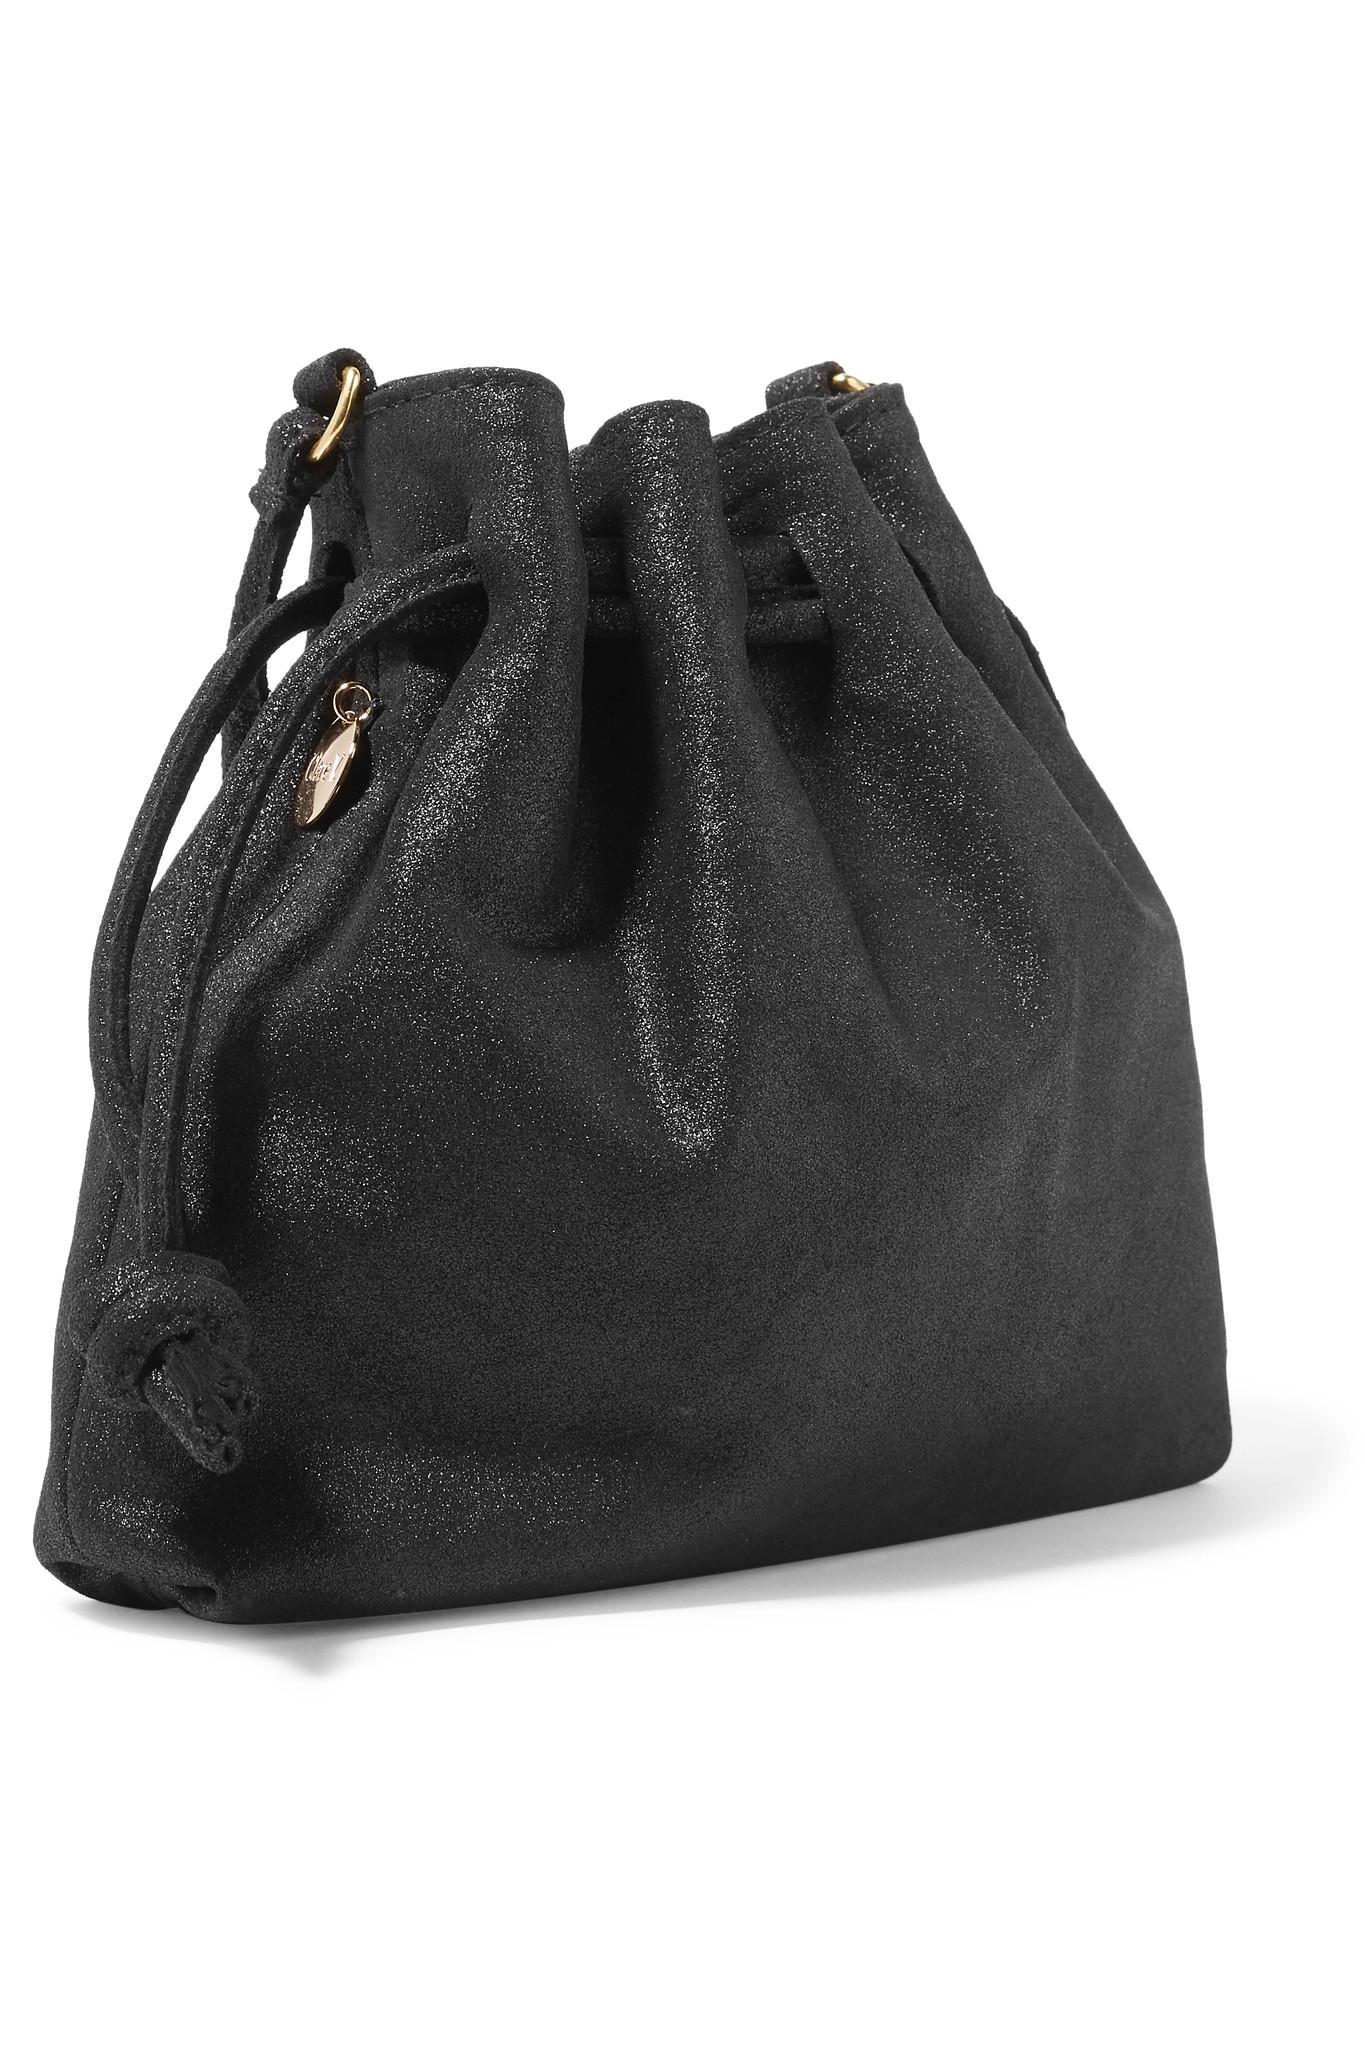 2597ff0276 Clare V. Henri Small Metallic Suede Bucket Bag in Black - Lyst